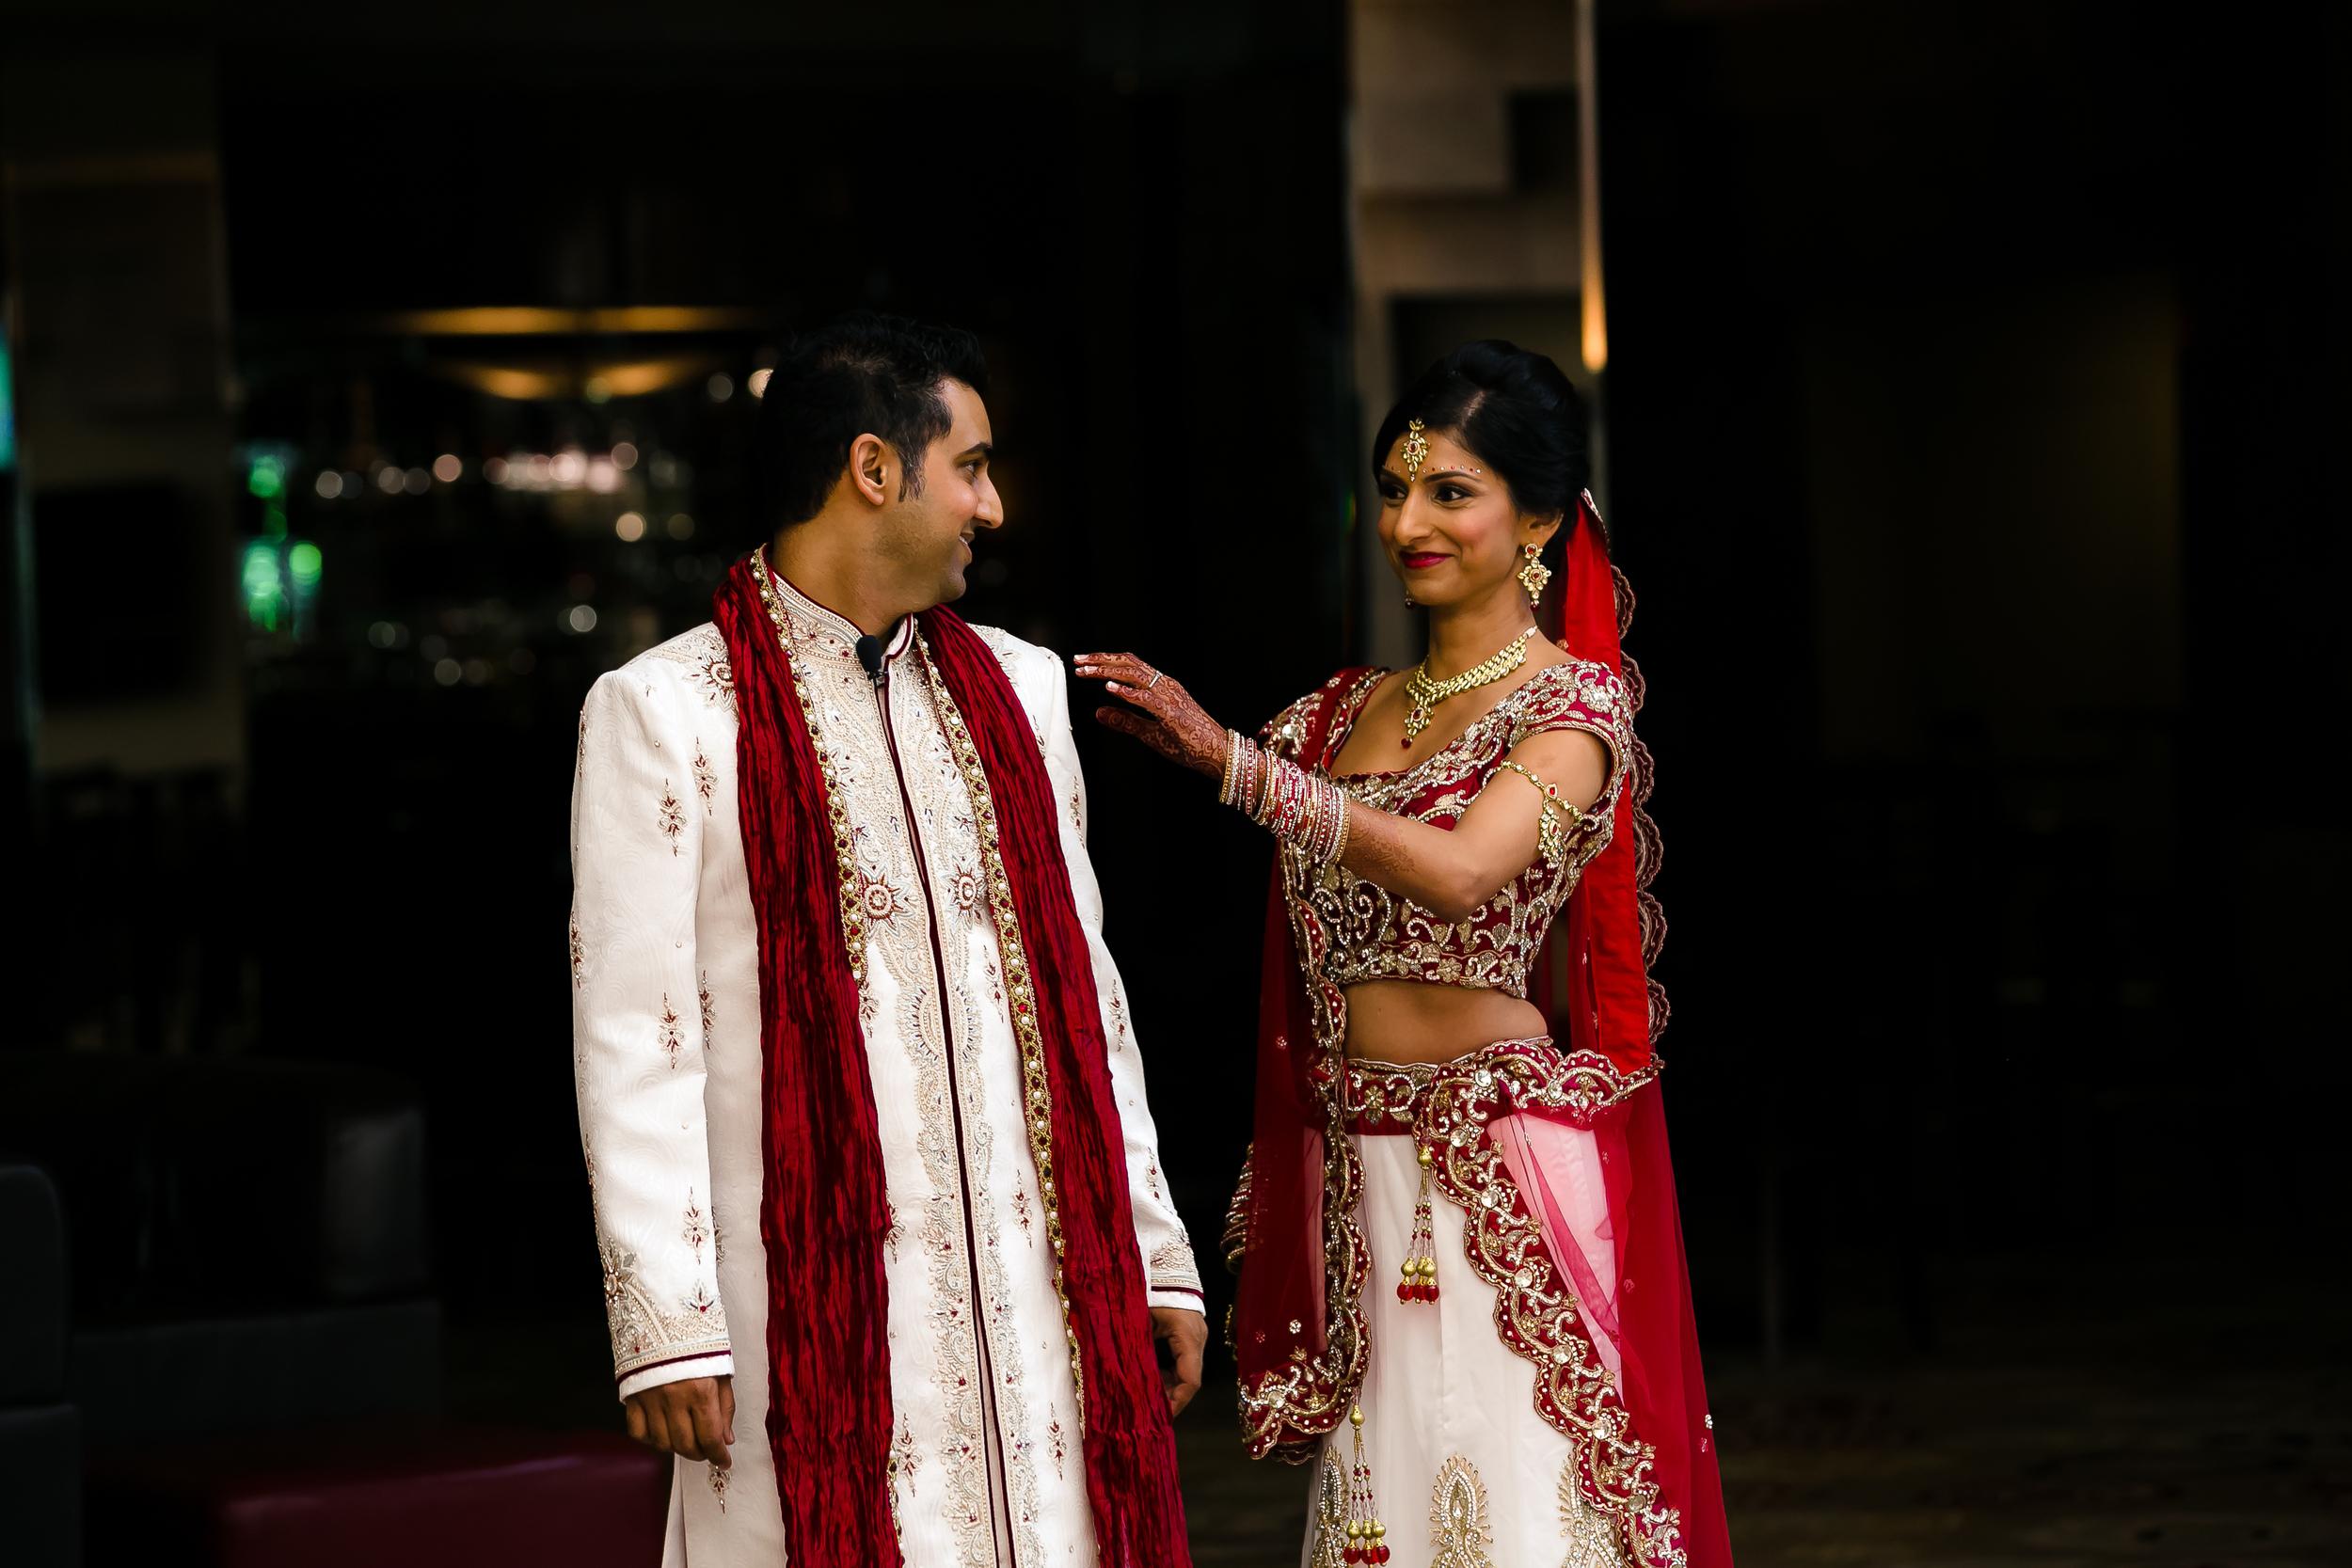 SOUTHEAST-ASIAN-INDIAN-WEDDING_008.jpg